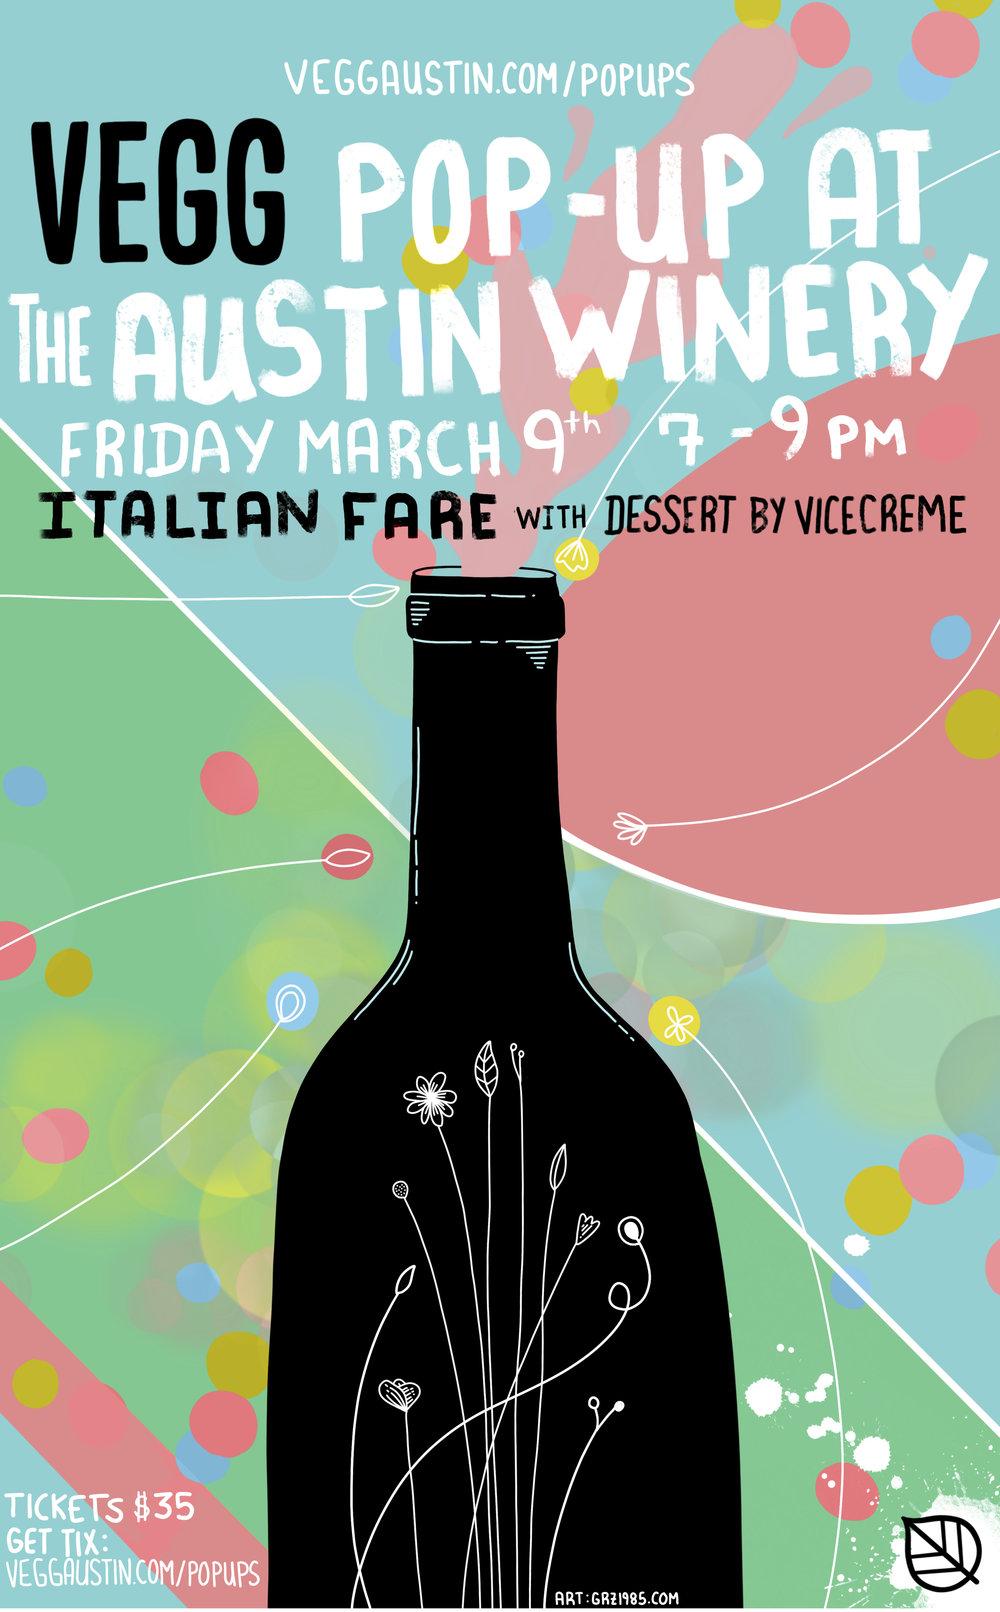 VEGG Austin Winery Italian Pop-Up 11x17.jpg